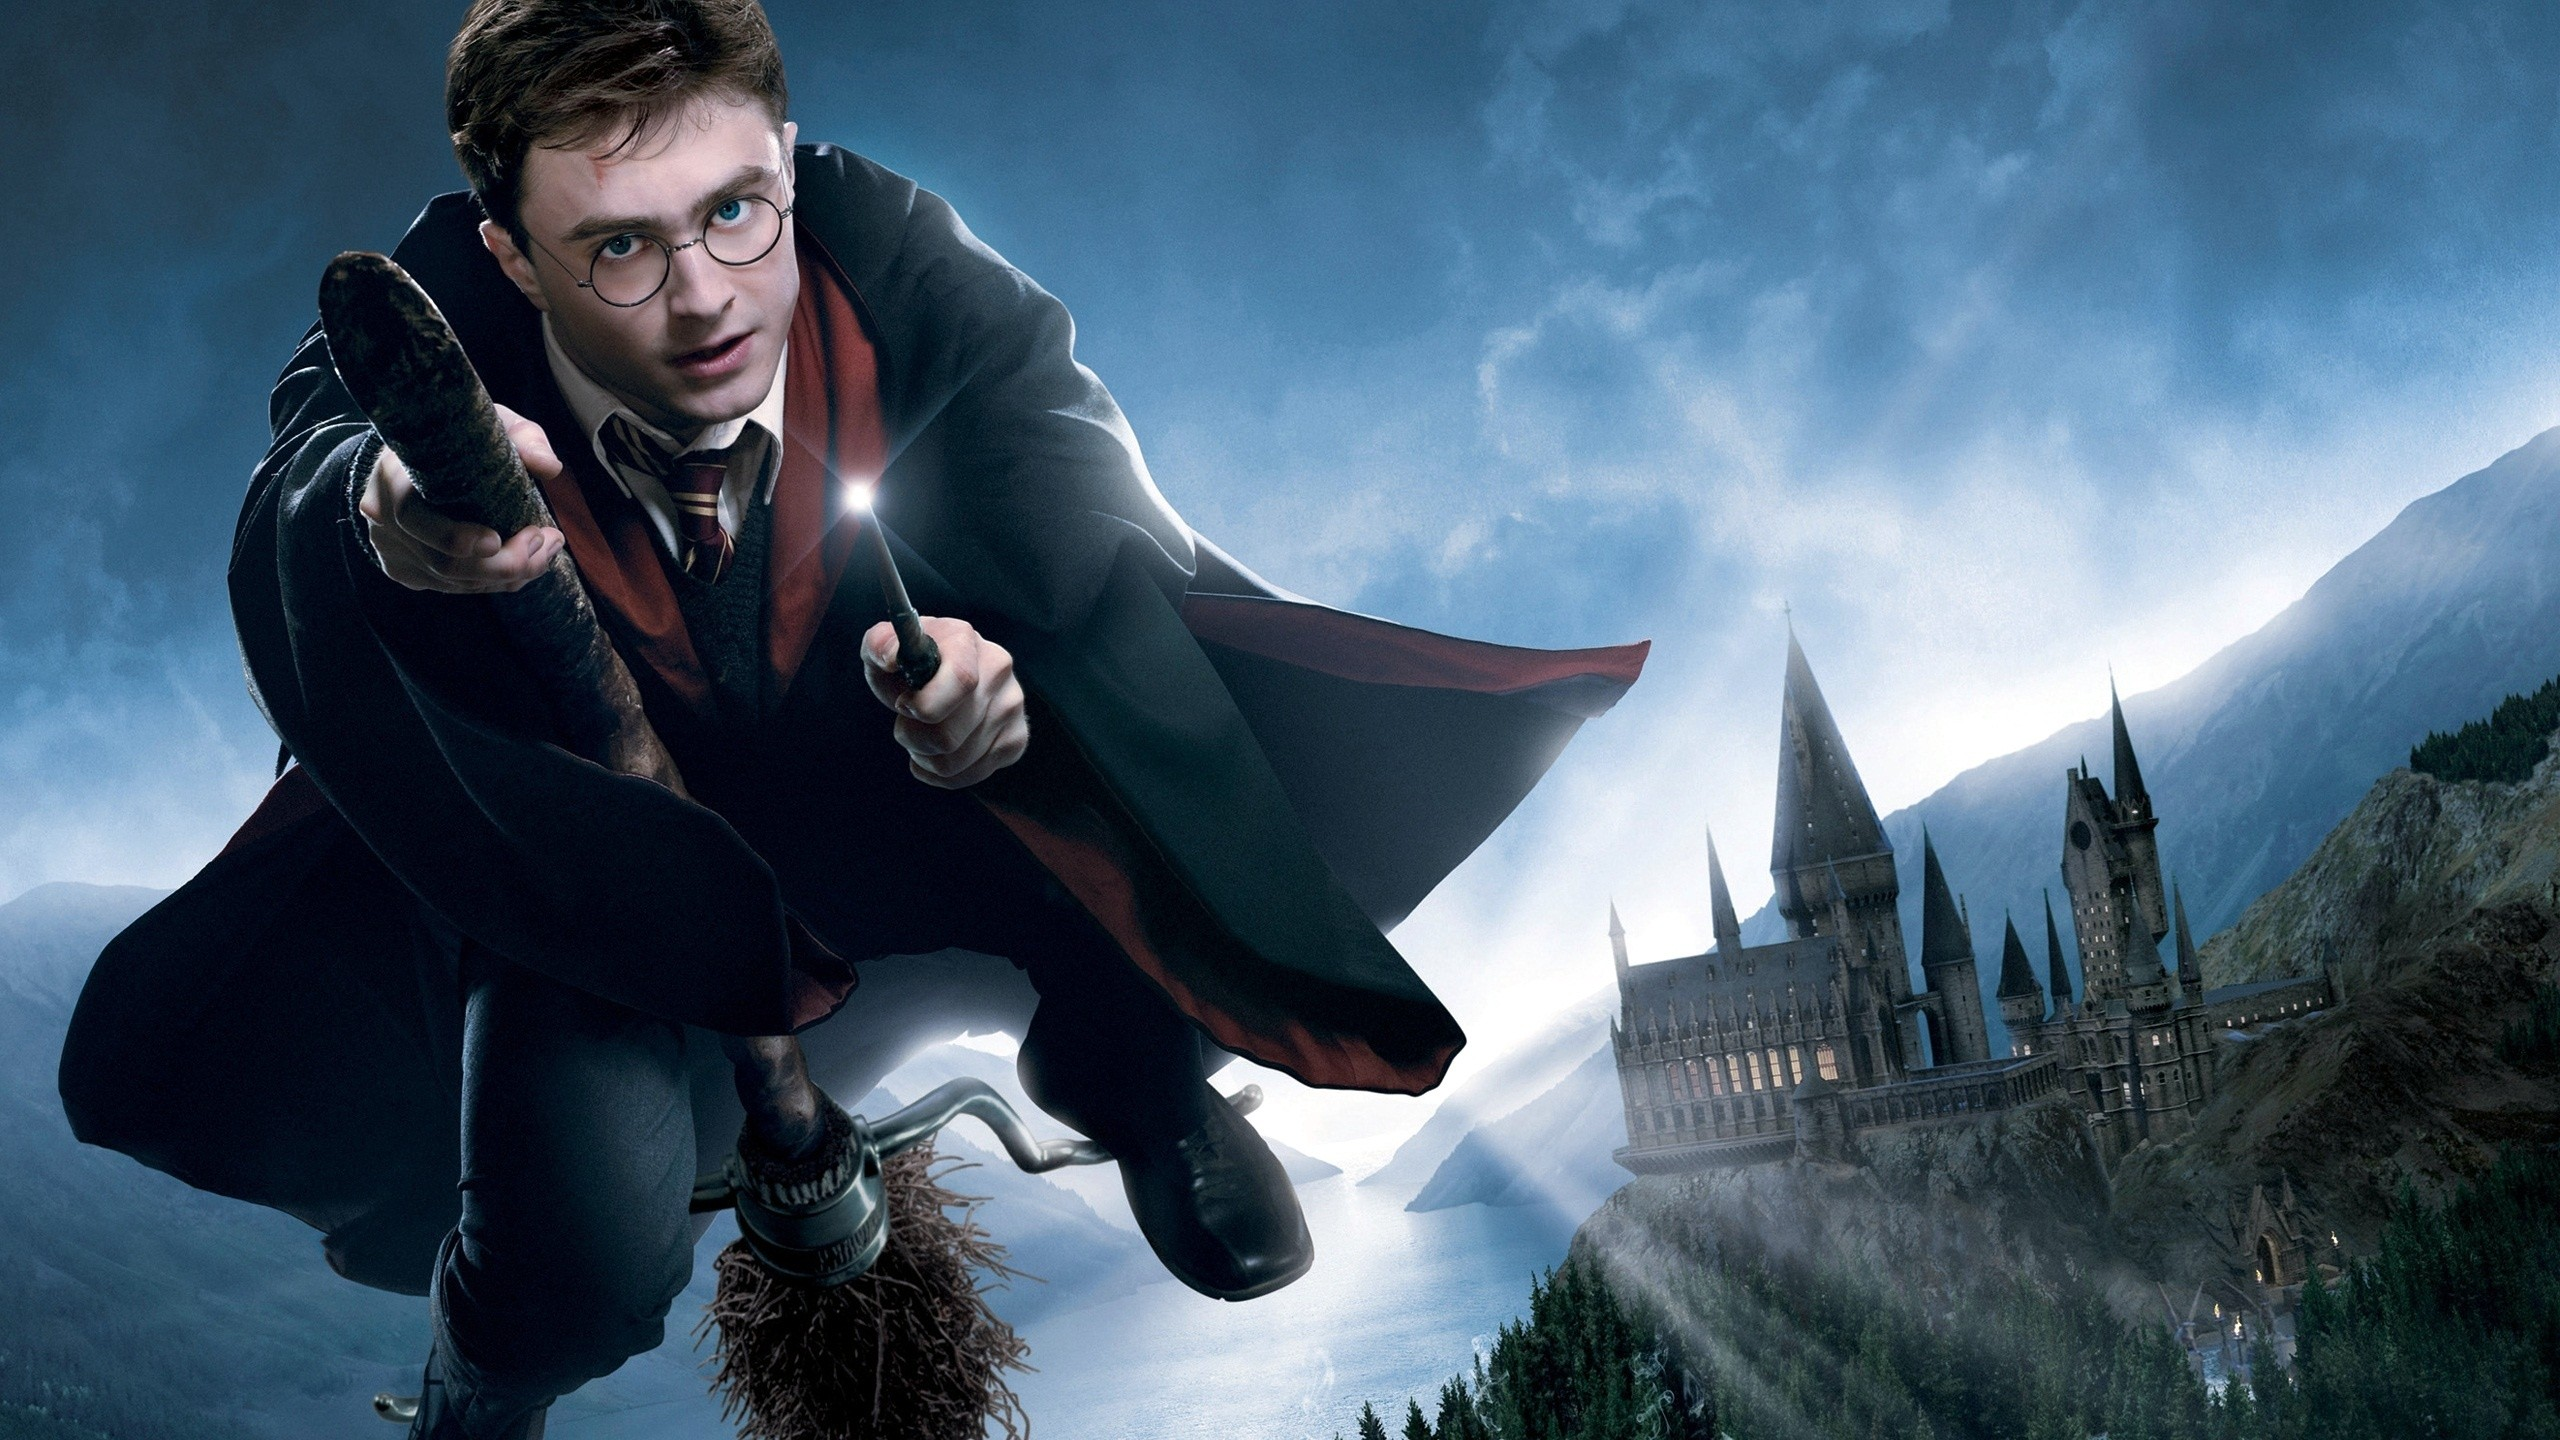 People 2560x1440 Harry Potter Hogwarts castle Daniel Radcliffe